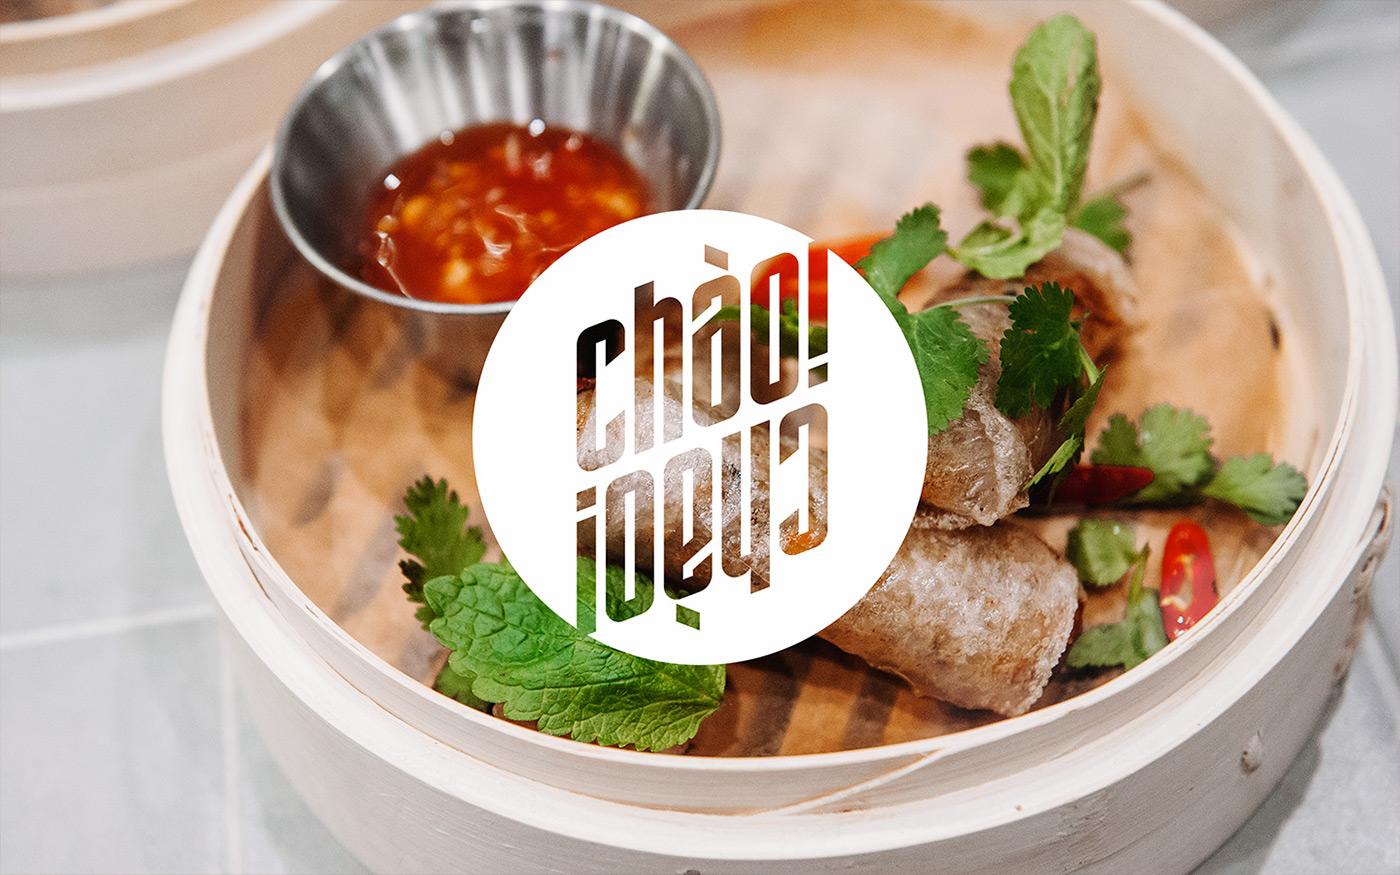 Restaurant Branding cafe branding restaurant logo cafe logo Asian Food vietnamese food the nineteen branding  visual identity